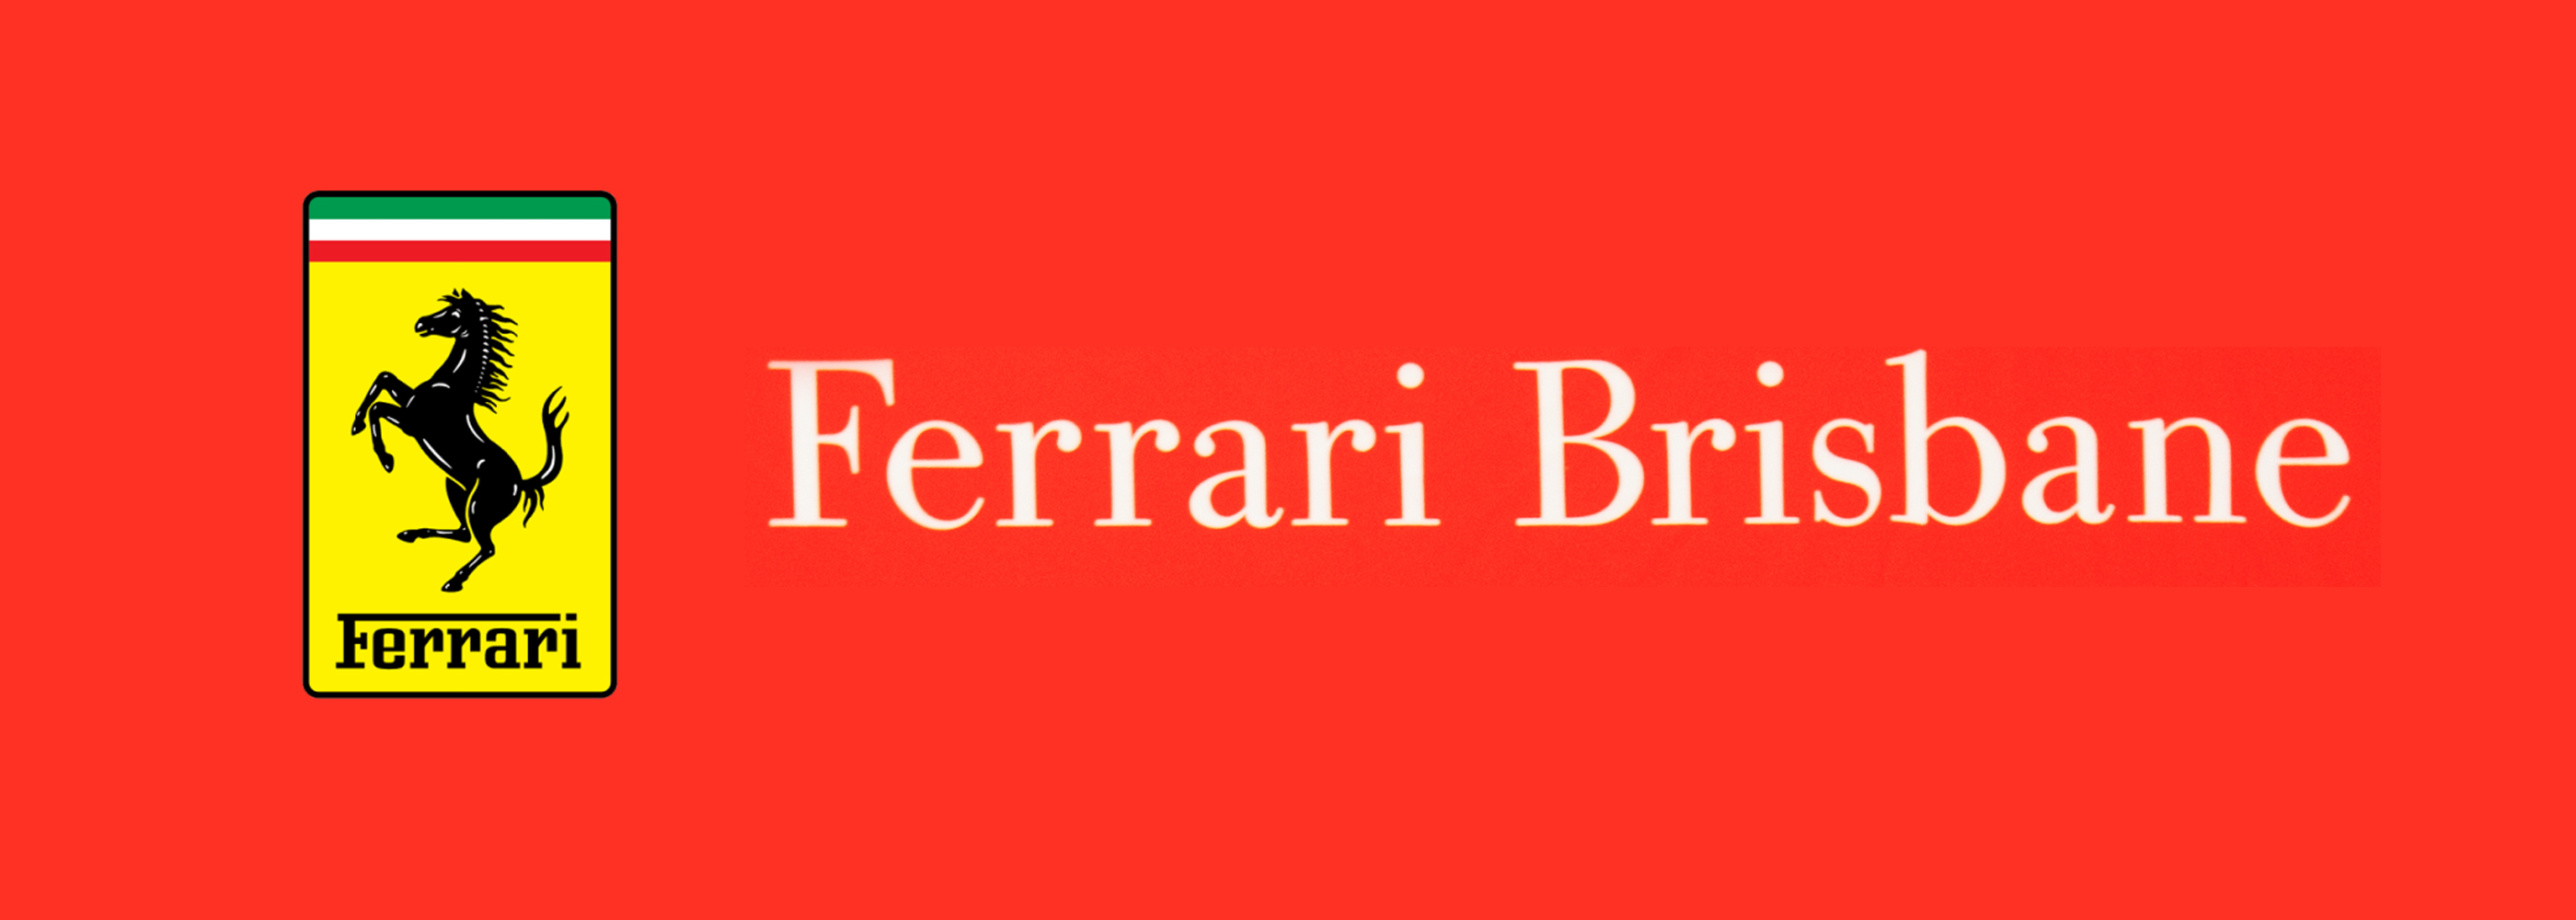 Brisbane_Event_Photography-Ferrari_1